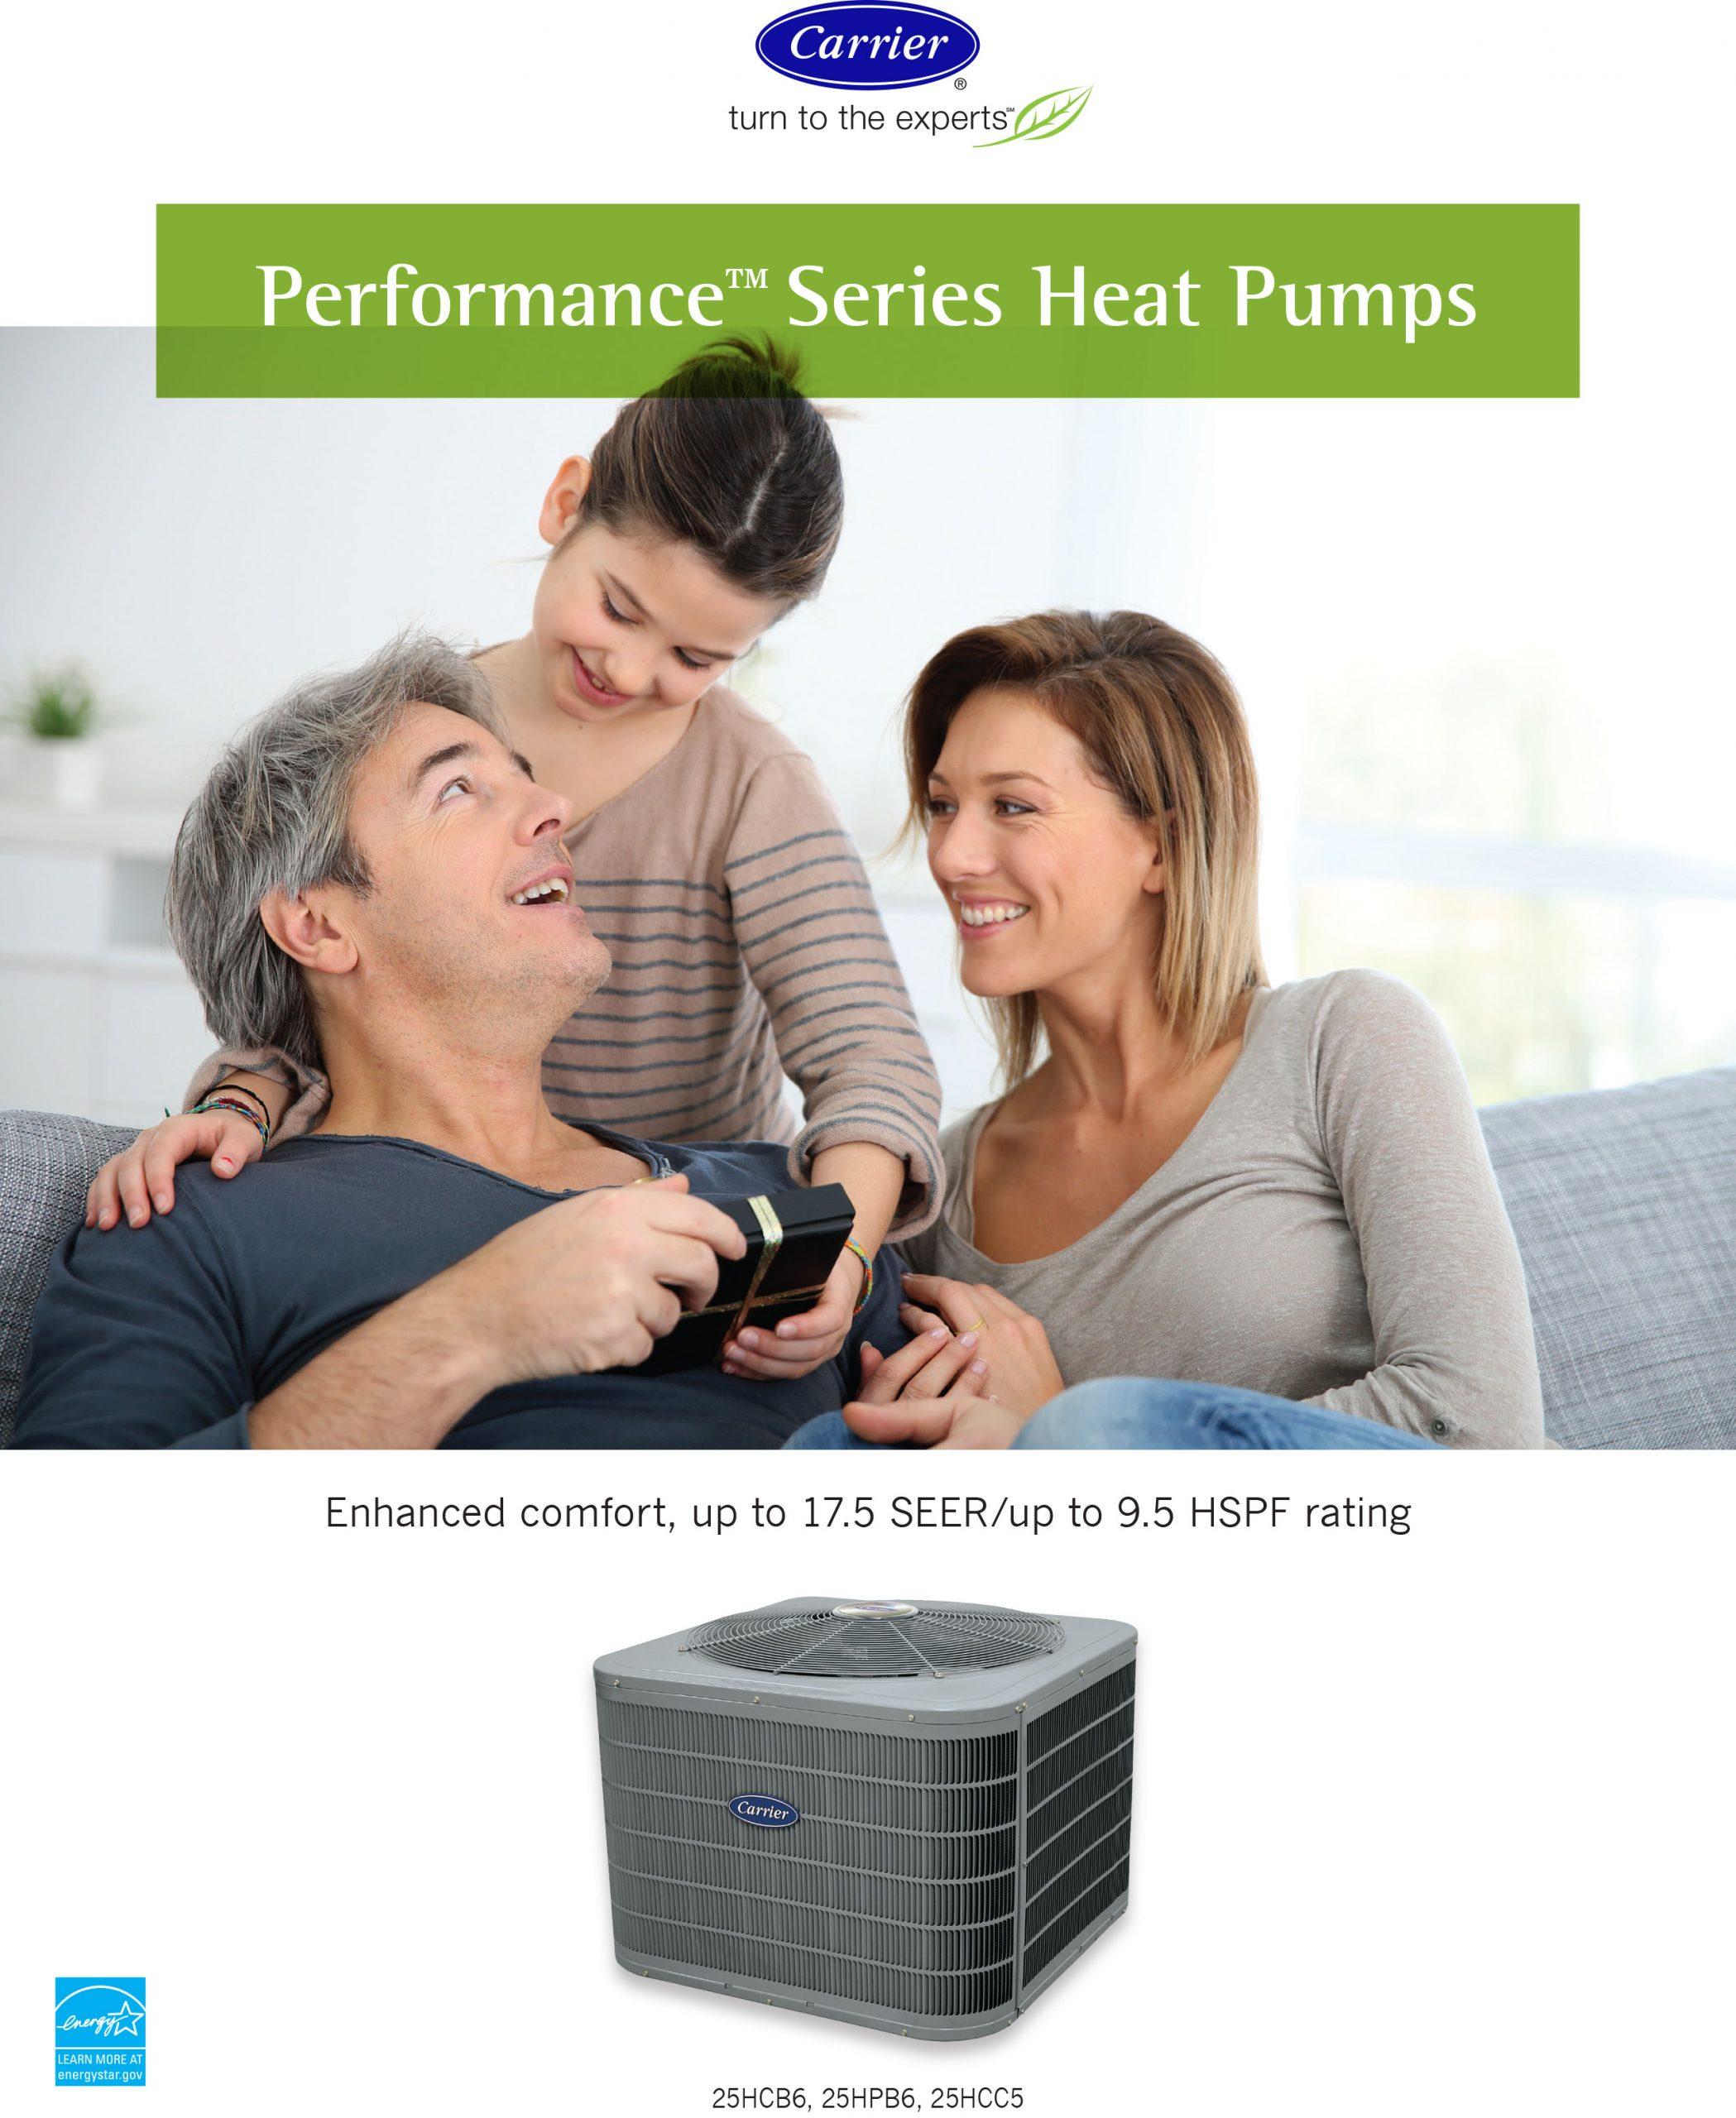 Performance Series Heat Pumps